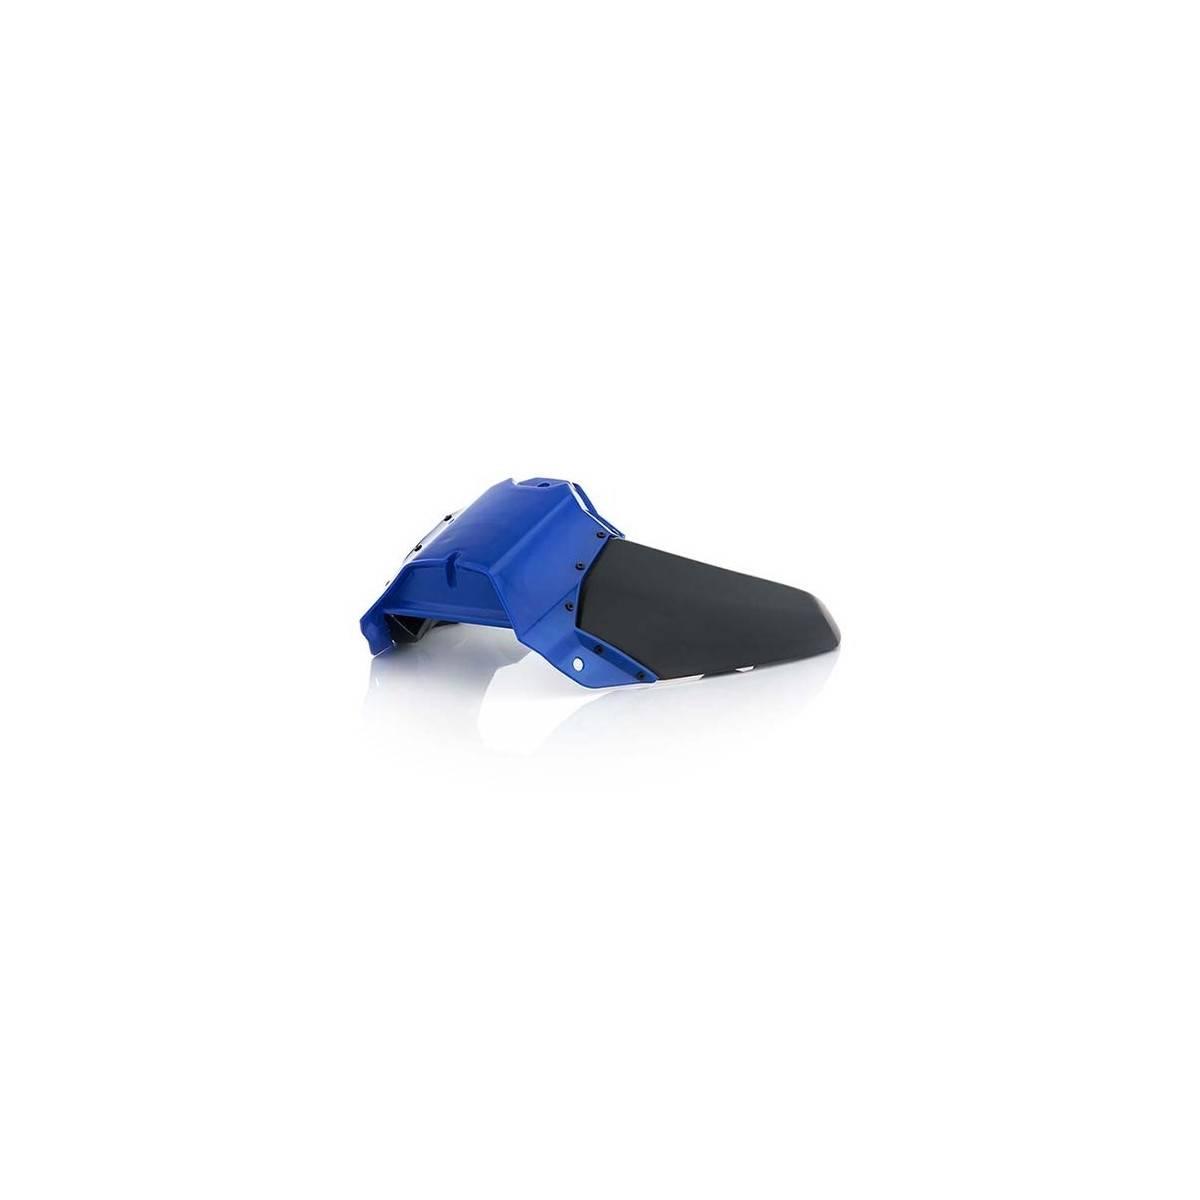 0017559-734 - Cubierta Radiador Superior Yzf250 14 18 Azul Negro